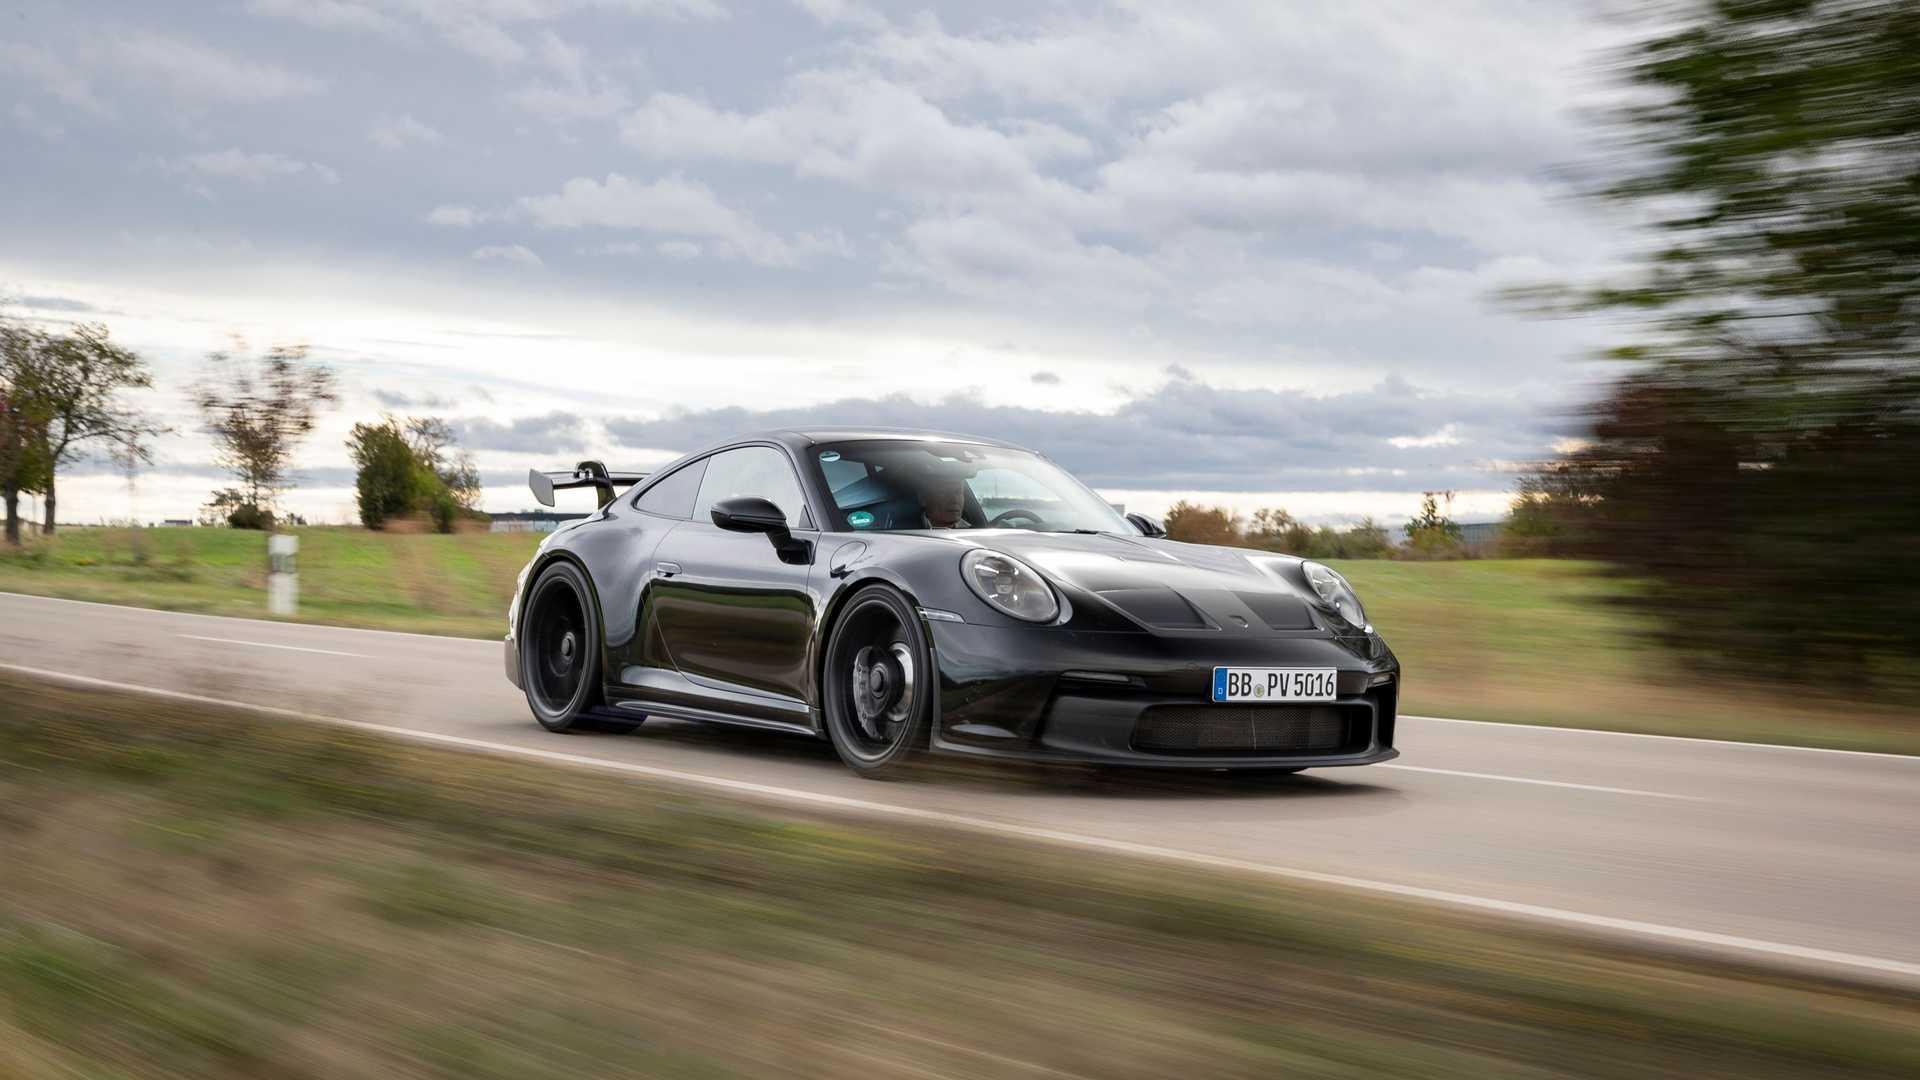 2021-porsche-911-gt3-prototype-front-quarter-tracking